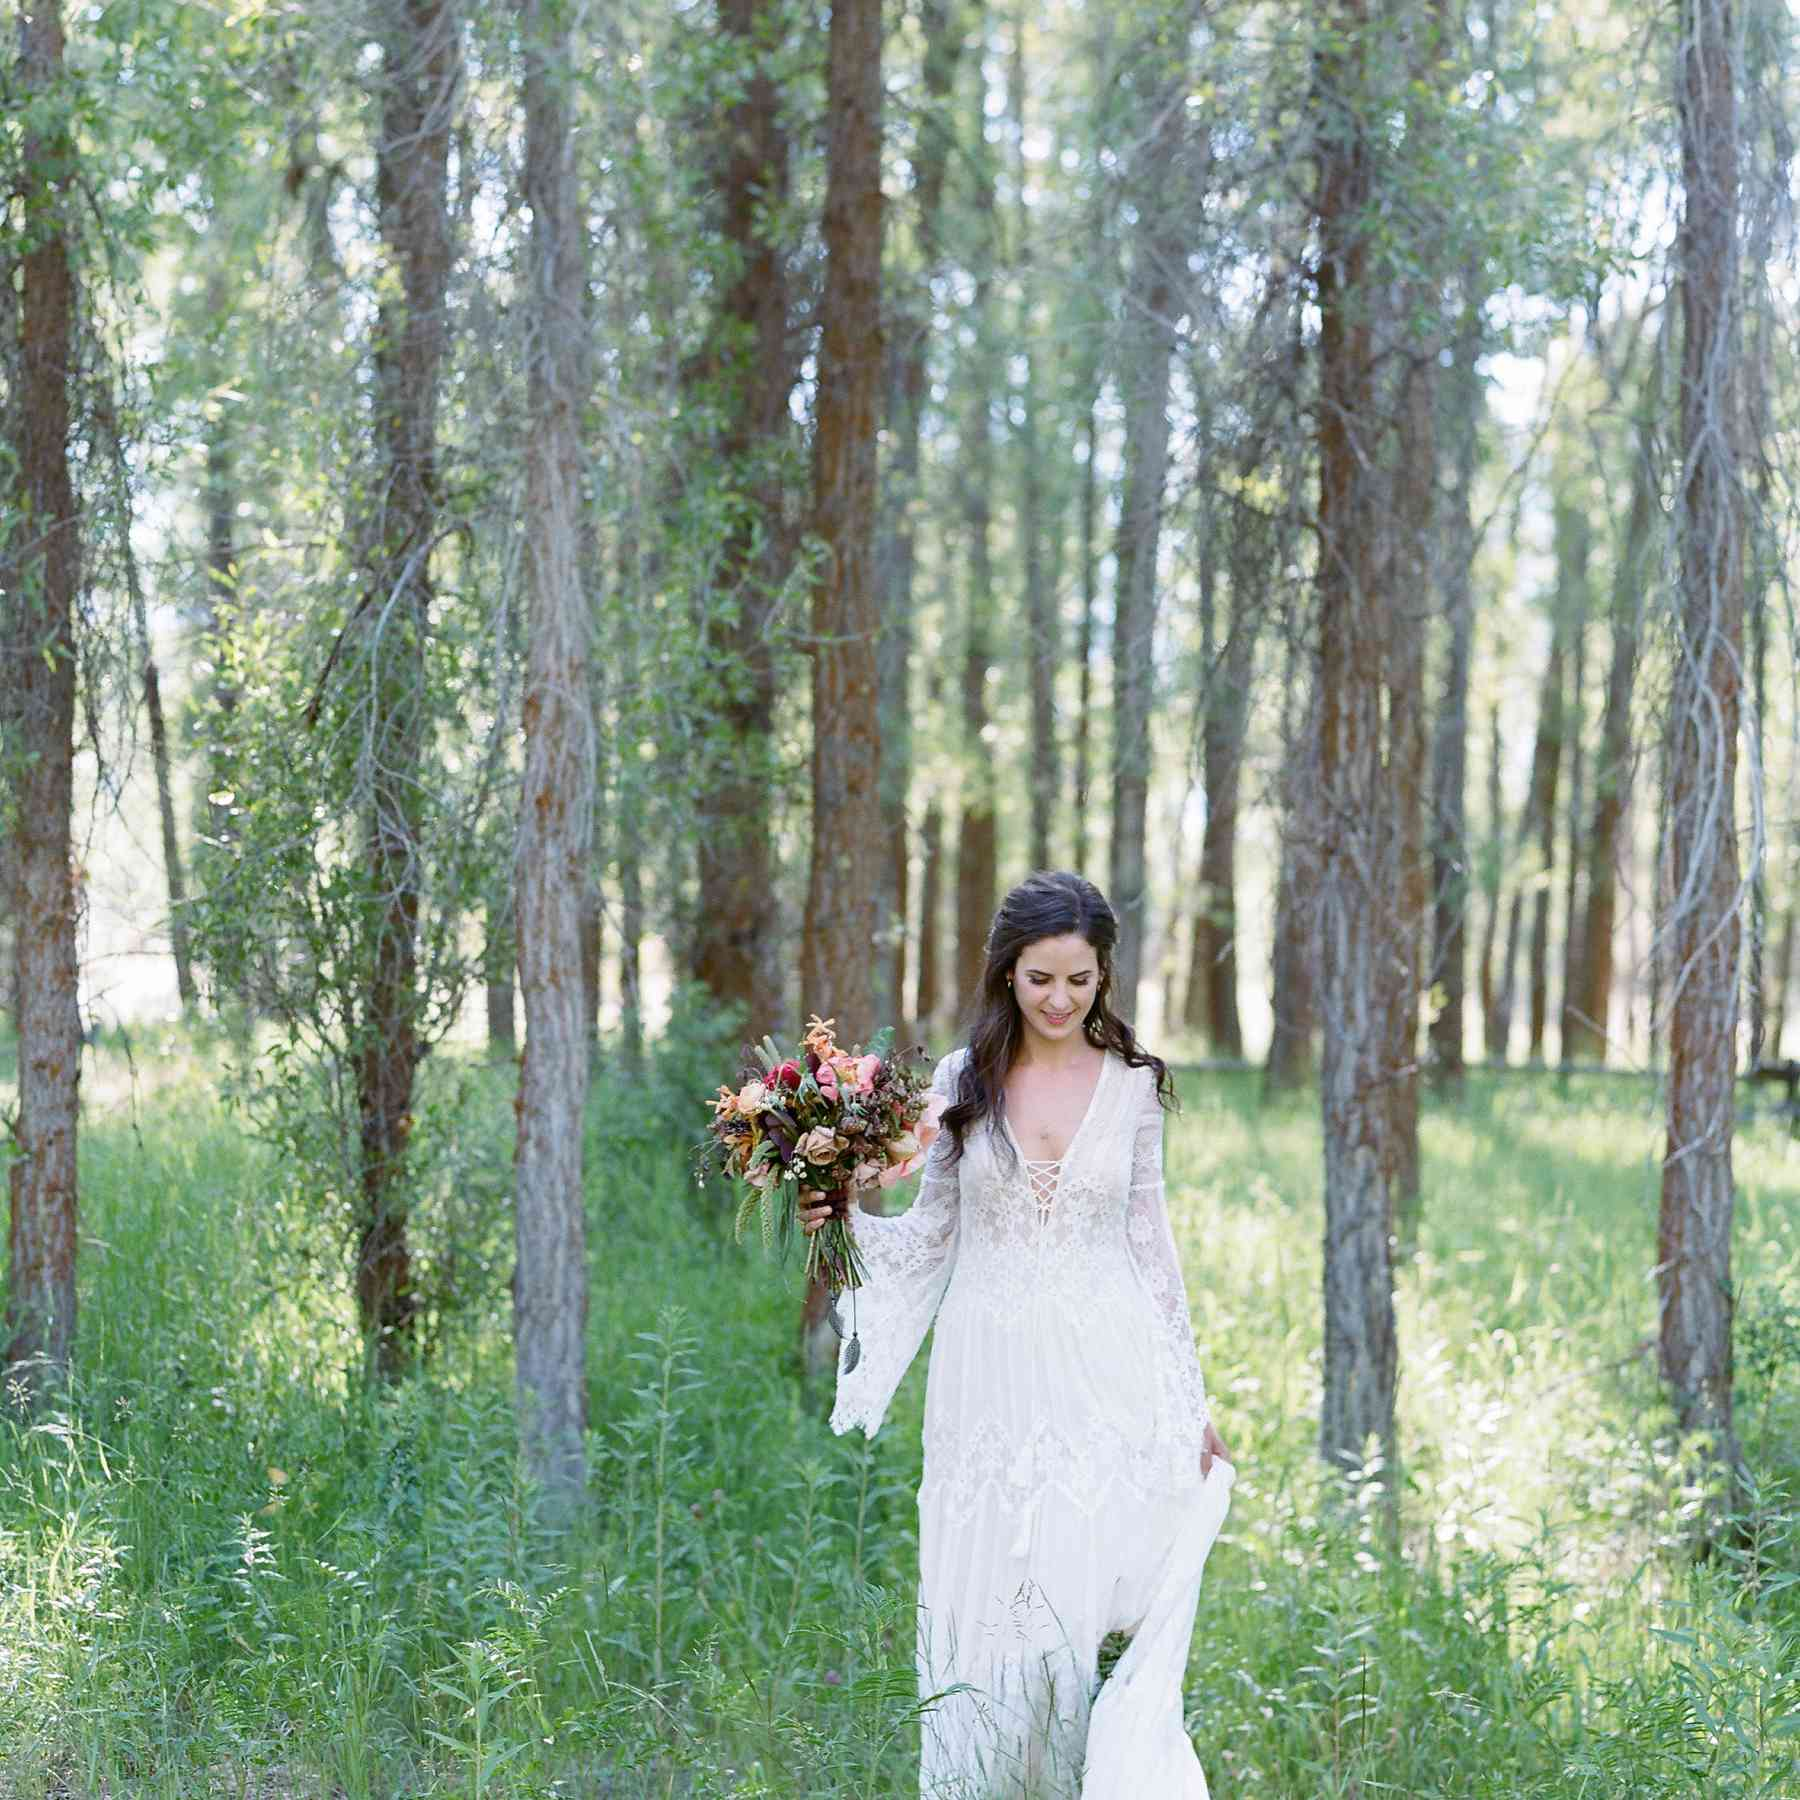 <p>Bride solo with bouquet</p><br><br>